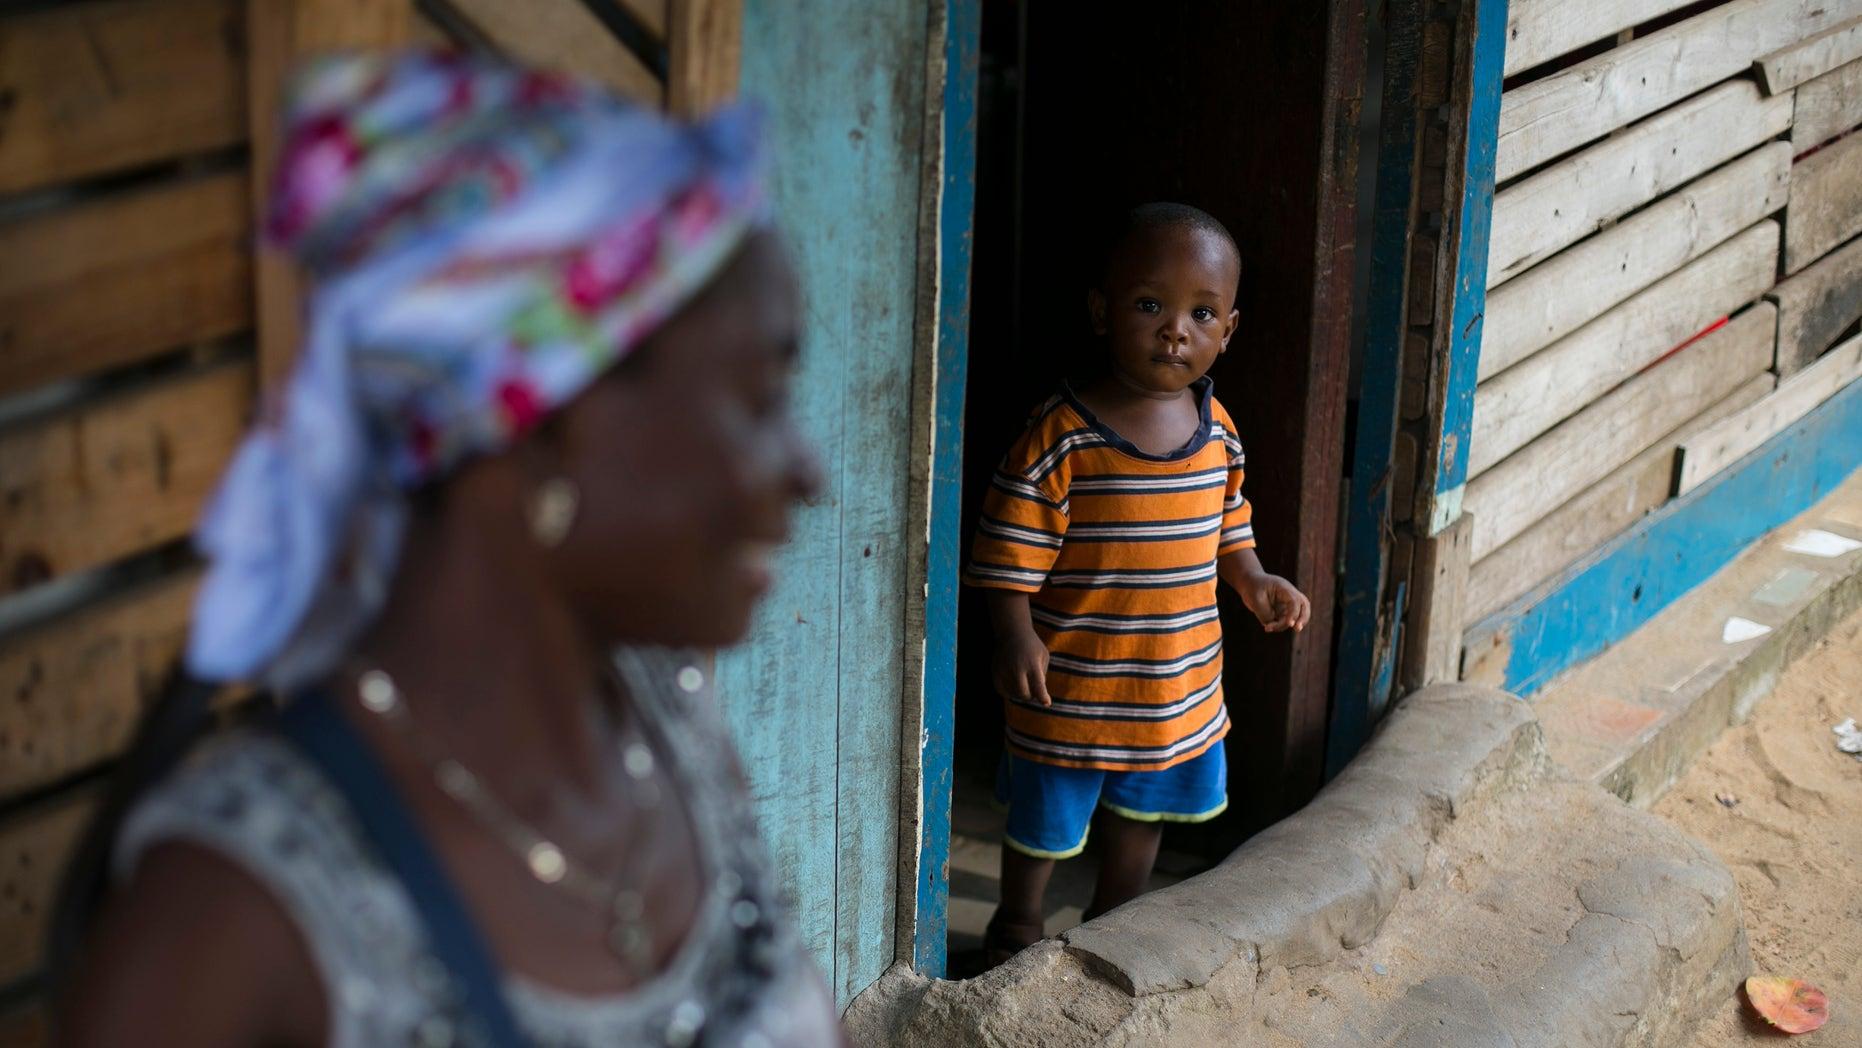 A Sierra Leonean boy looks out of a doorway in Freetown, Sierra Leone, December 16, 2014. REUTERS/Baz Ratner